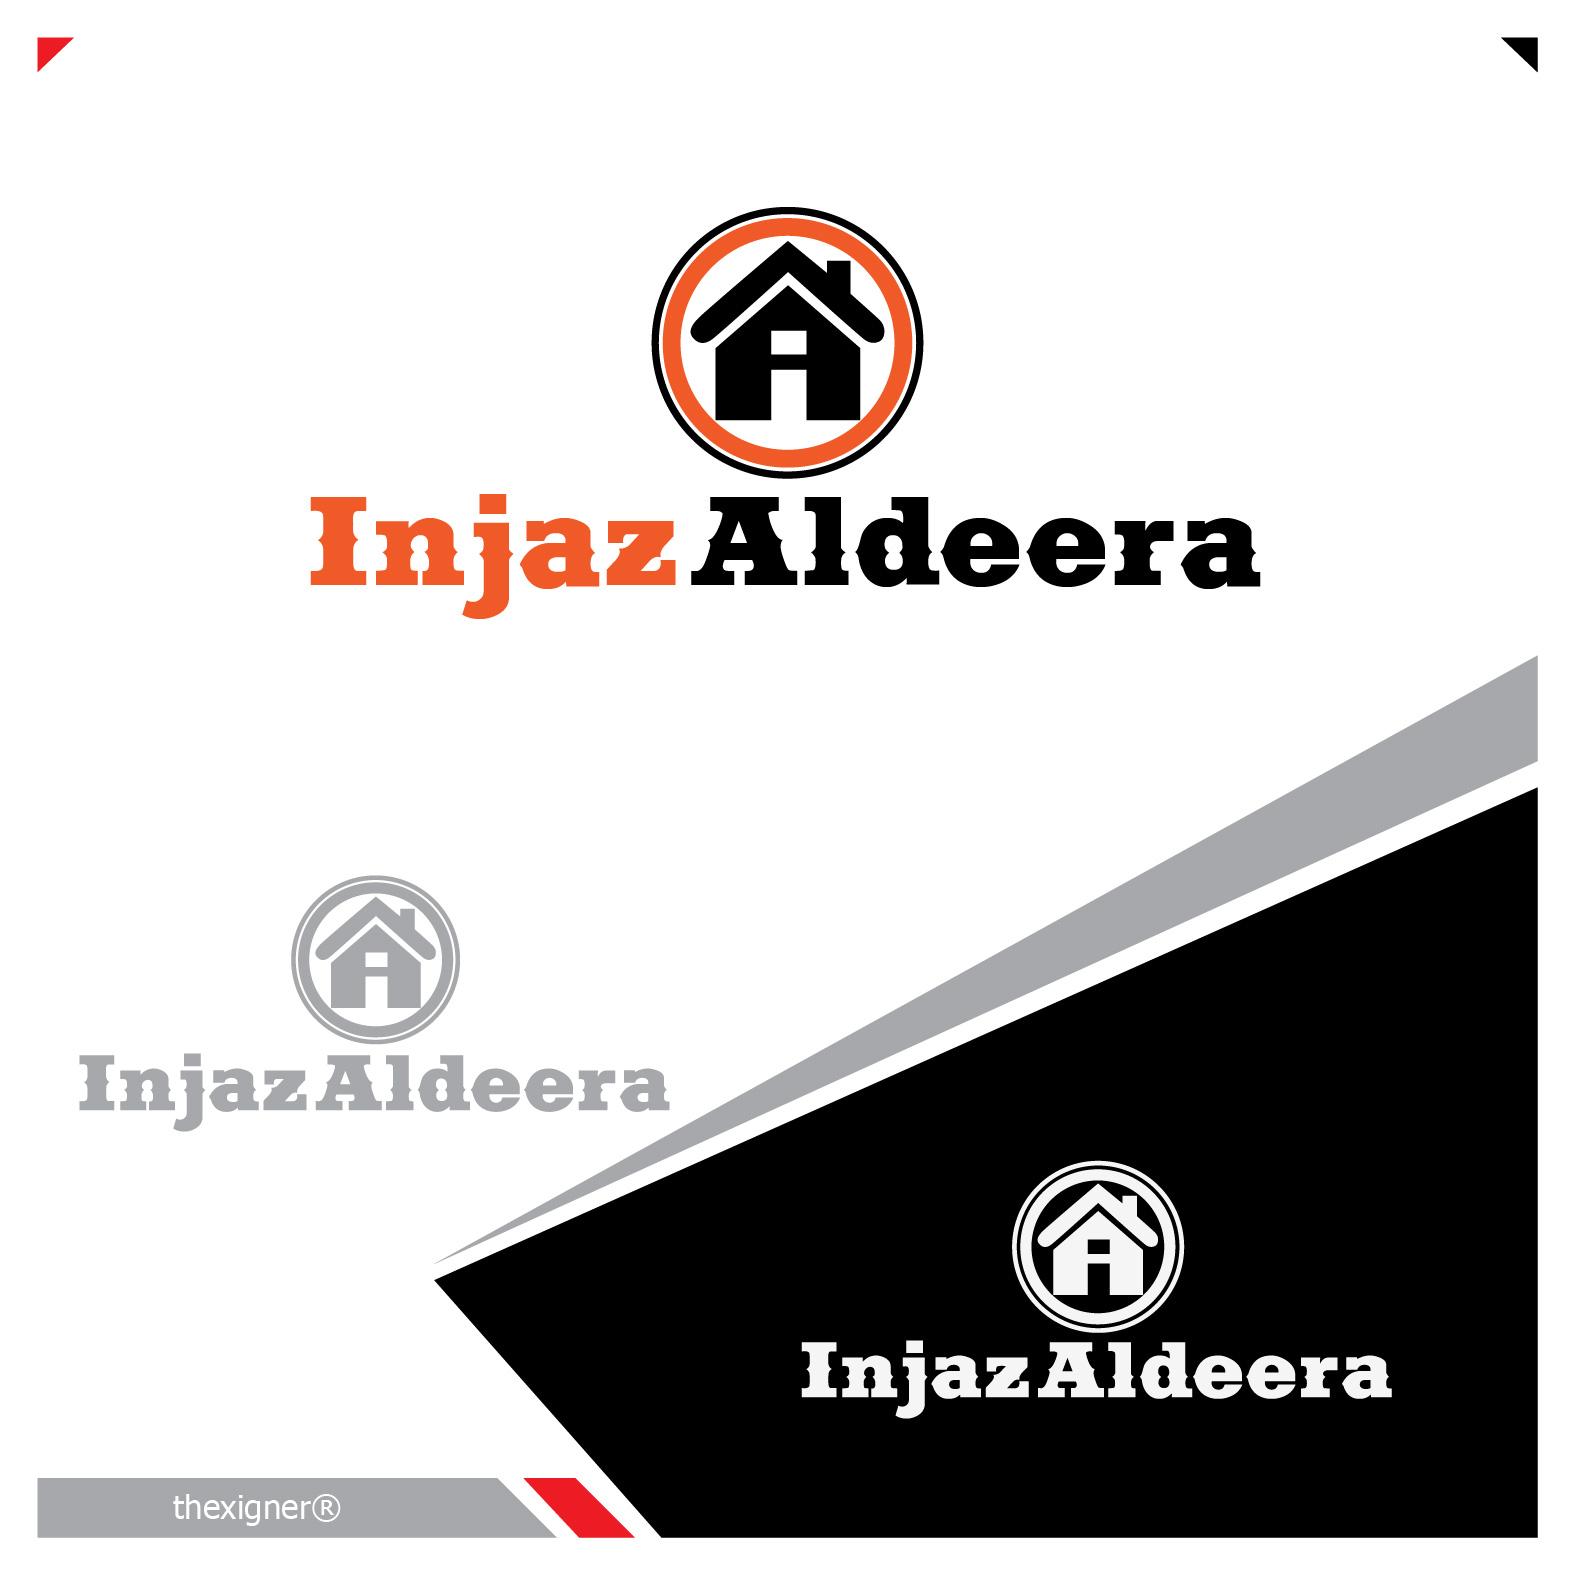 Logo Design by lagalag - Entry No. 22 in the Logo Design Contest Fun Logo Design for Injaz aldeera.